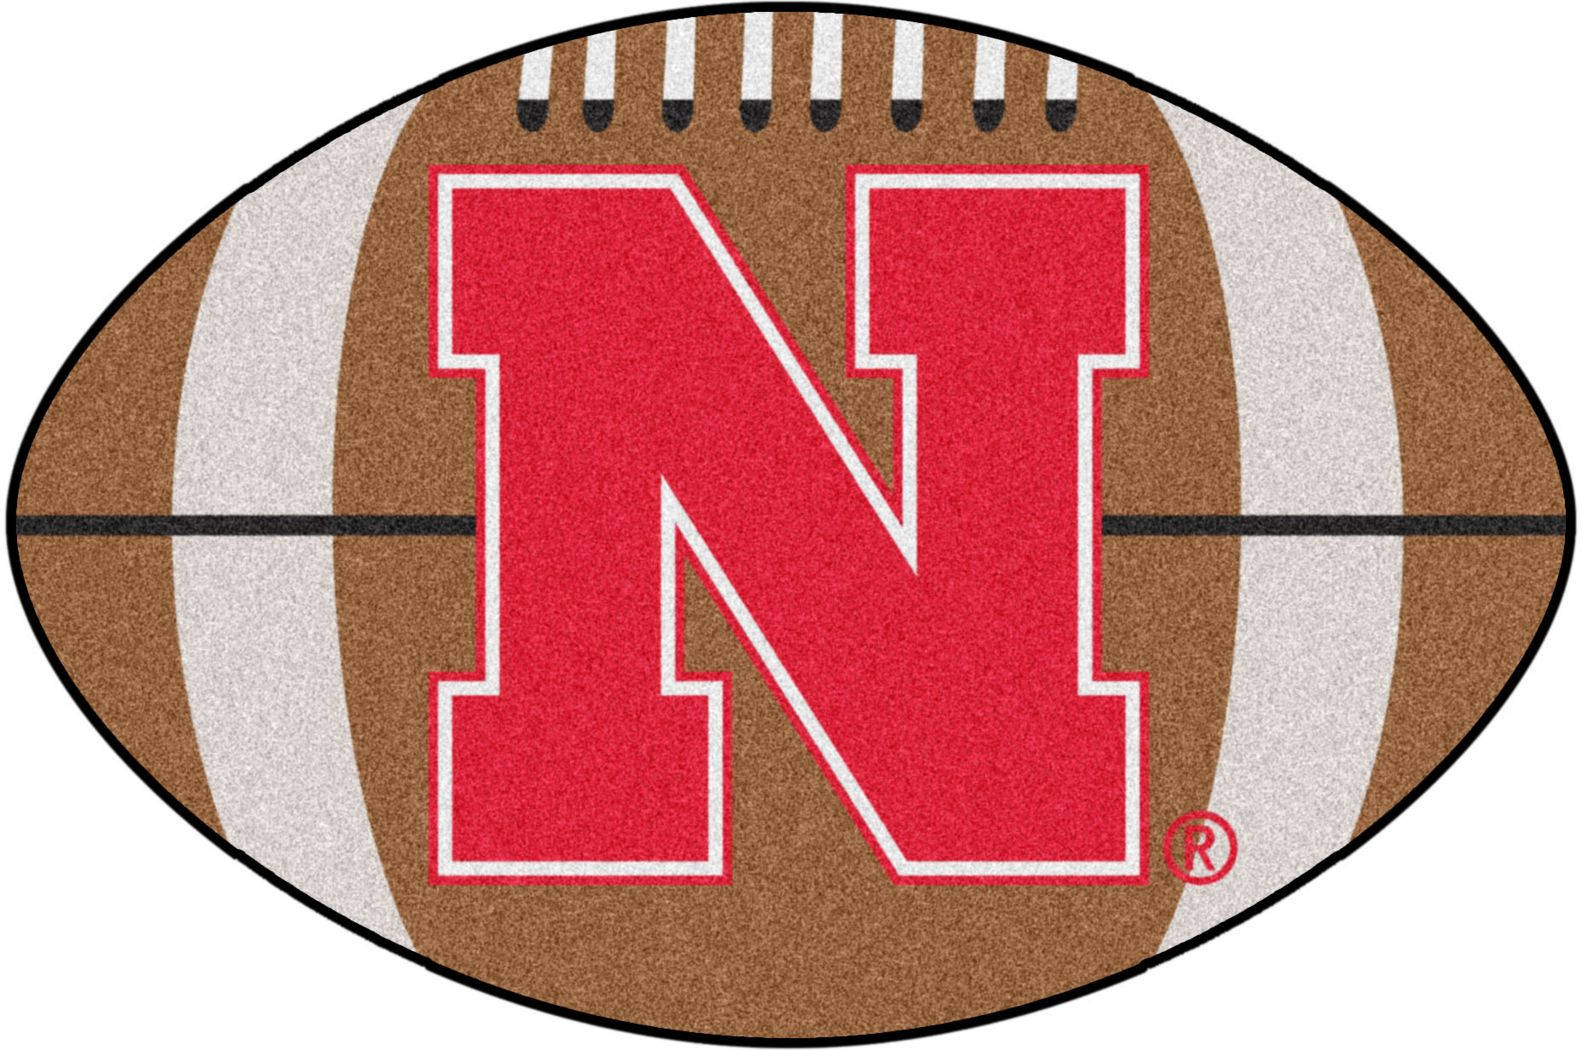 "NCAA Football Mascot University of Nebraska 1'6"" x 1'10"" Rug"